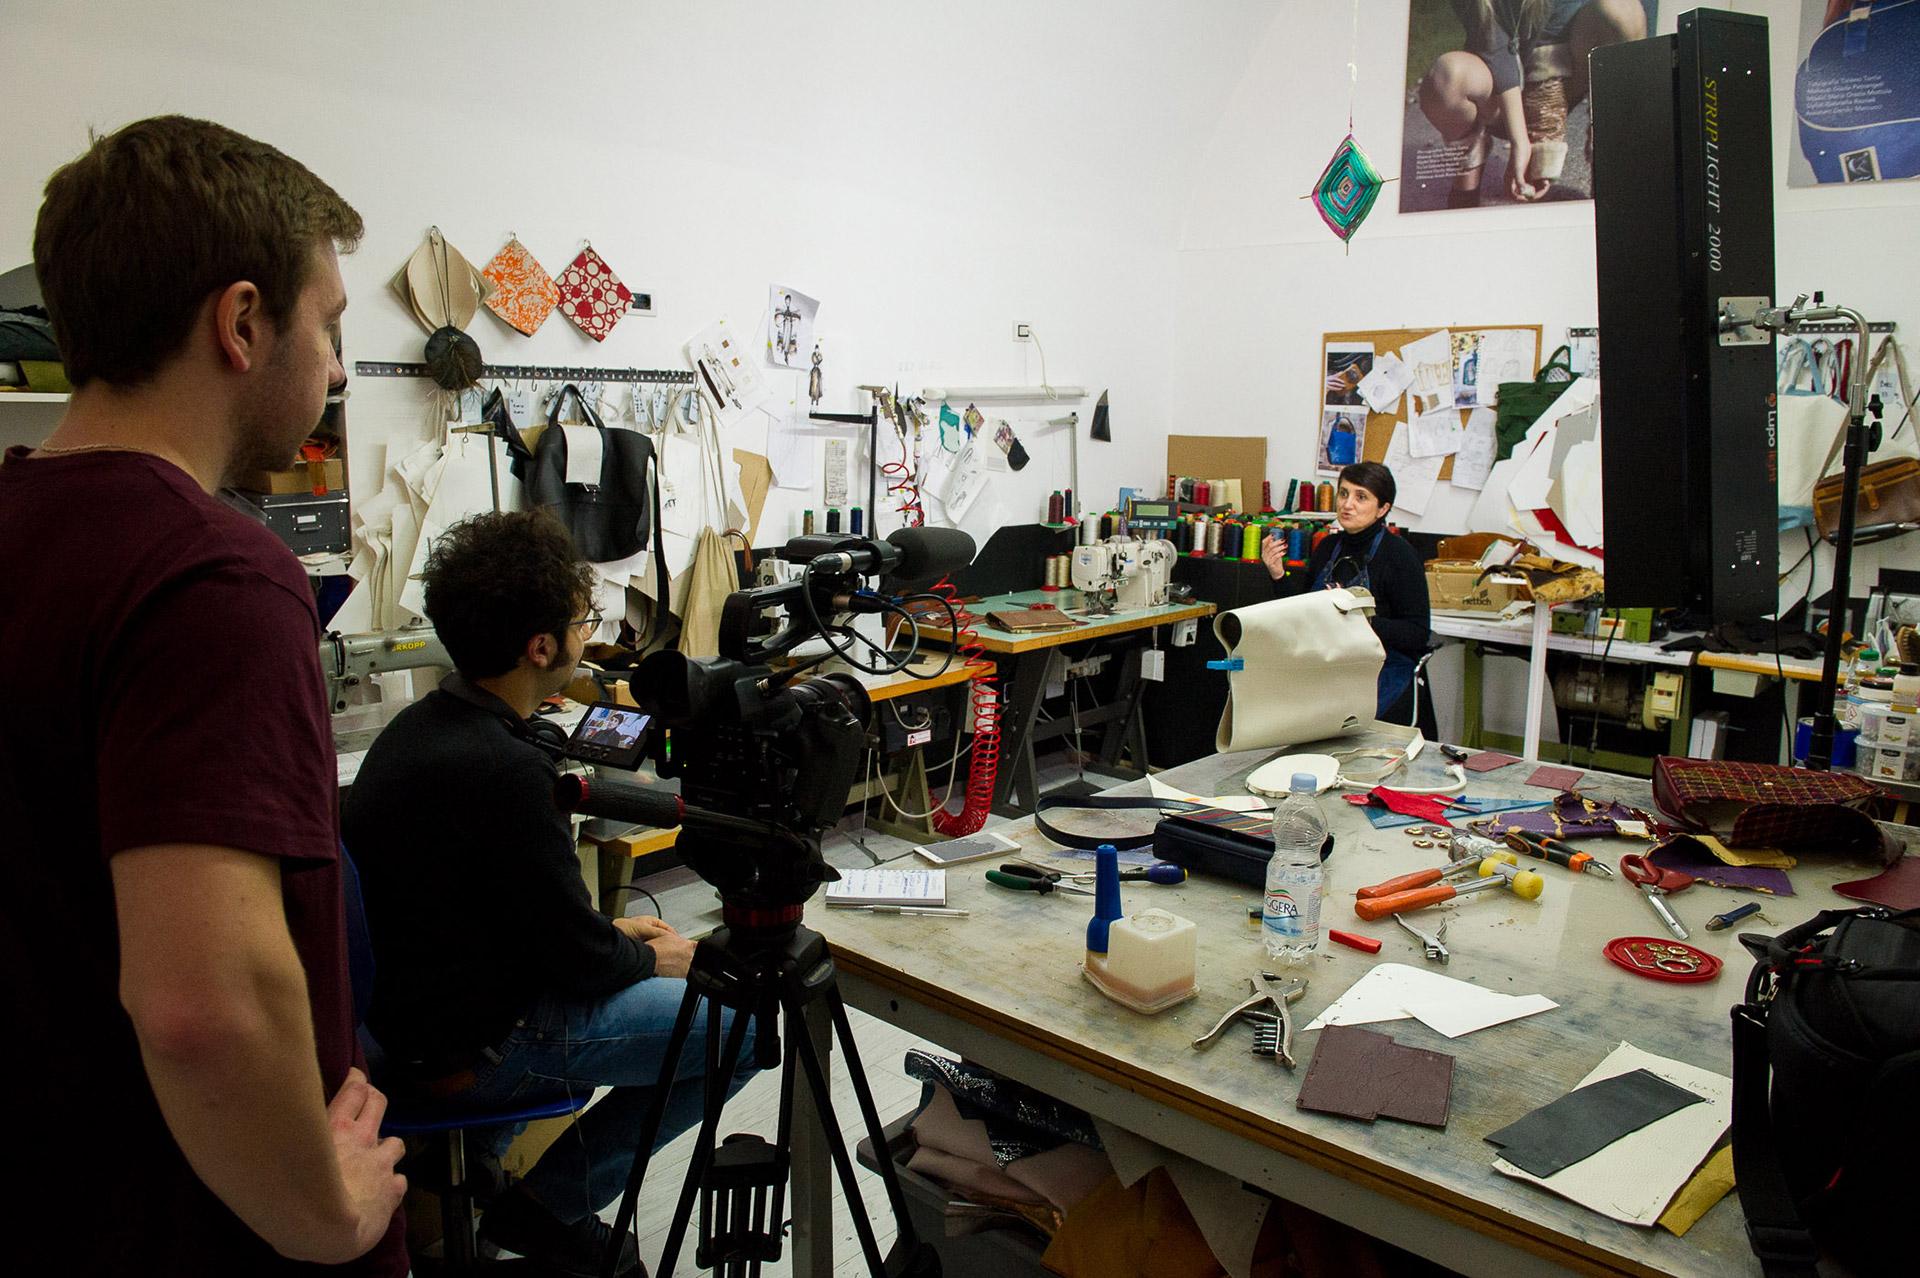 animado-film-produzioni-audiovisive-storie-di-sale-reznek-02